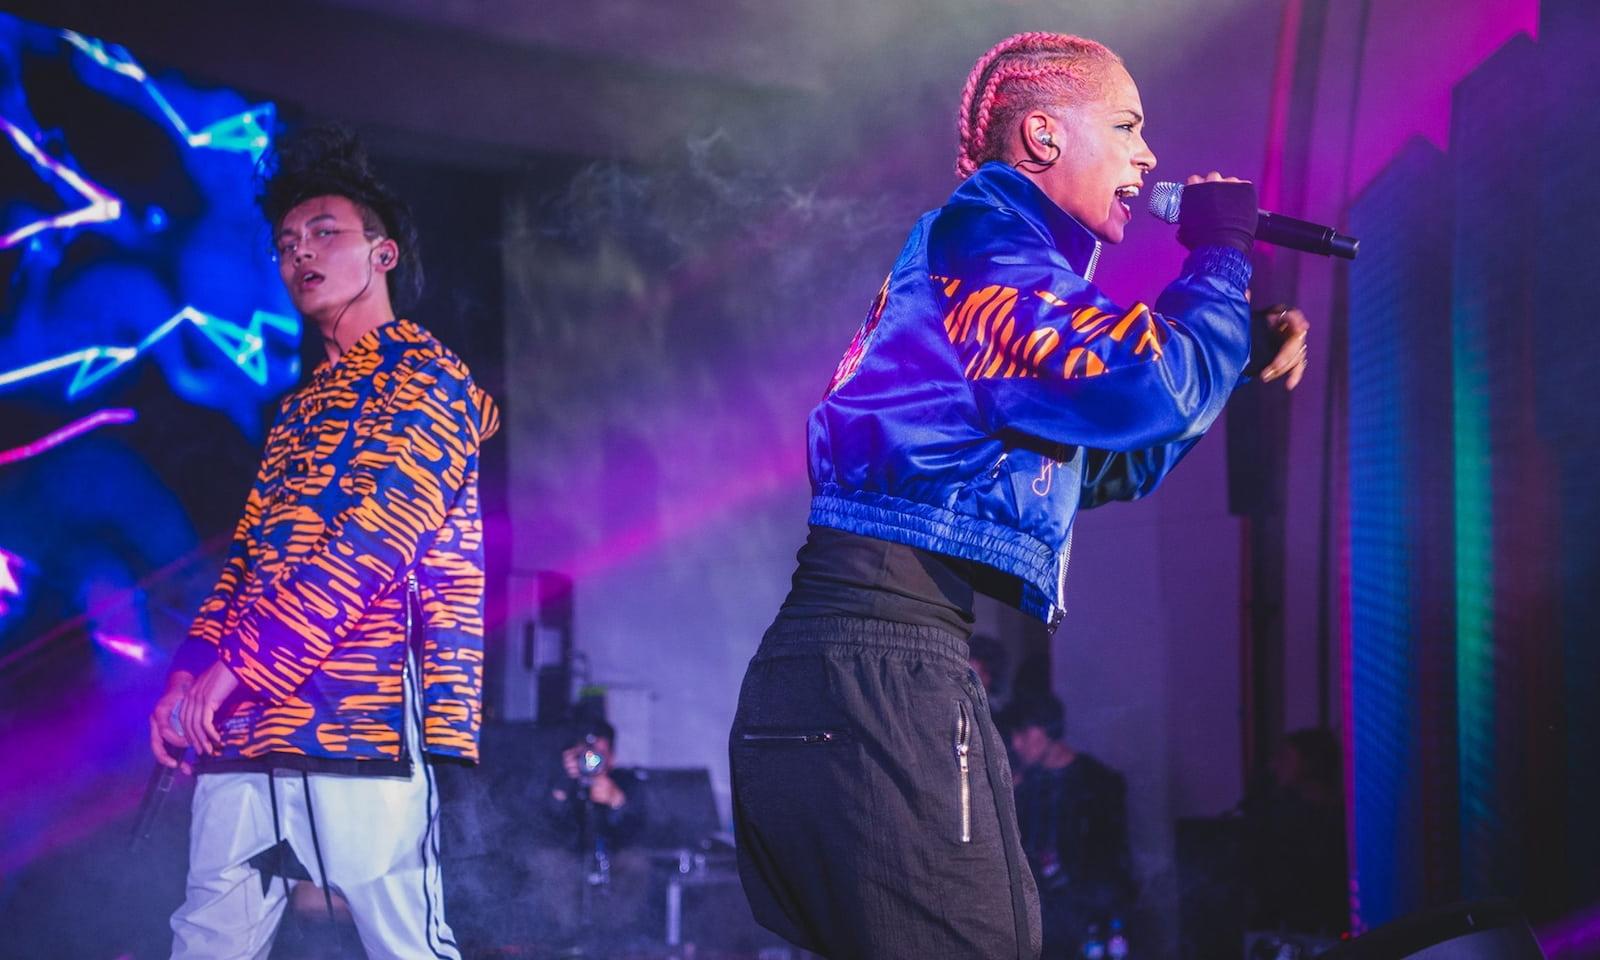 RoxXxan, The Tomboy Rapper Challenging Music Industry Standards